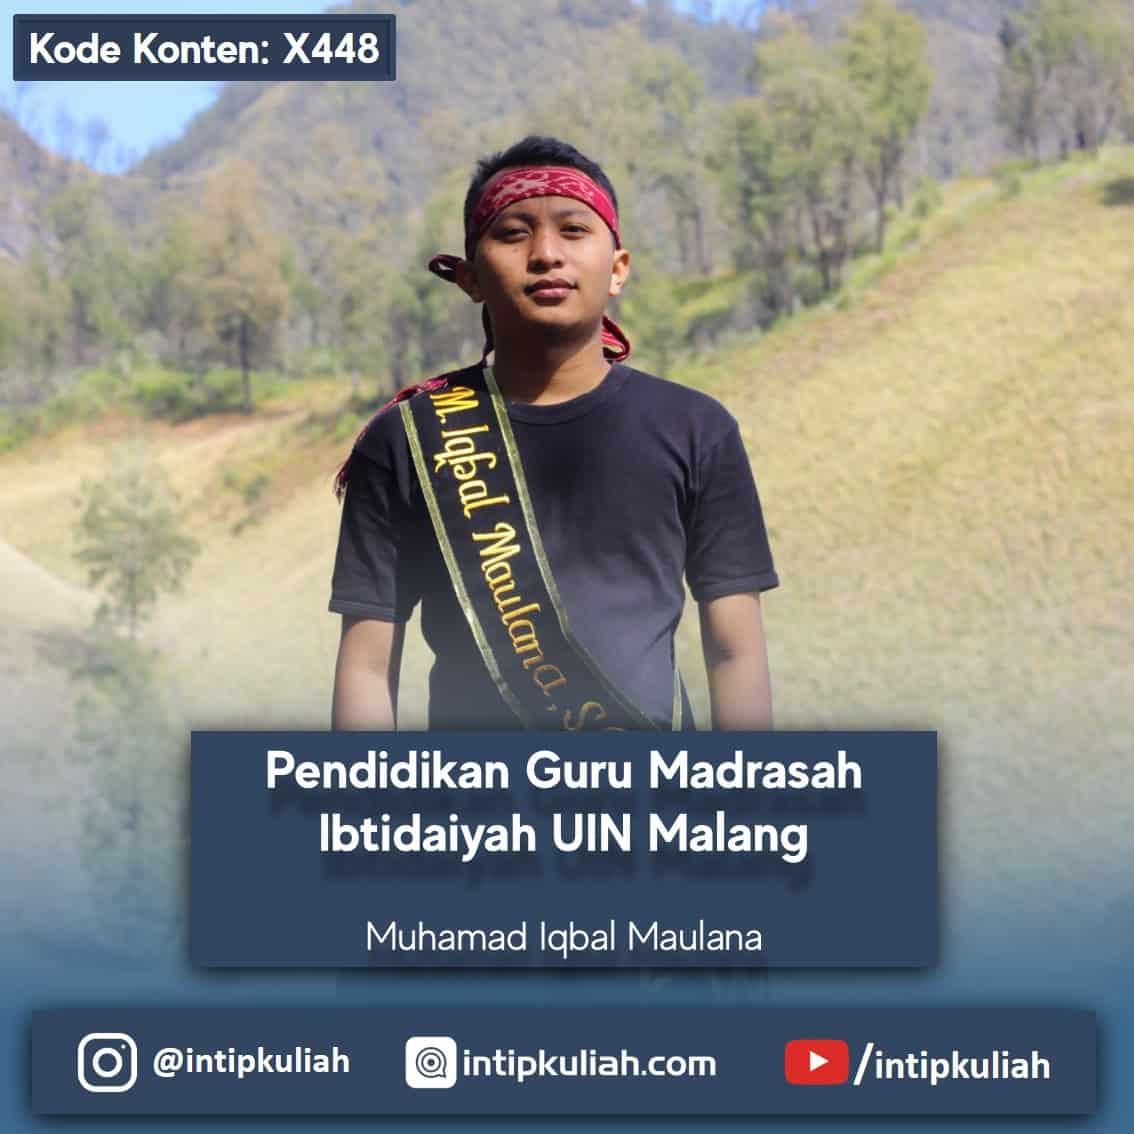 Pendidikan Guru Madrasah Ibtidaiyah UIN Malang (Iqbal)